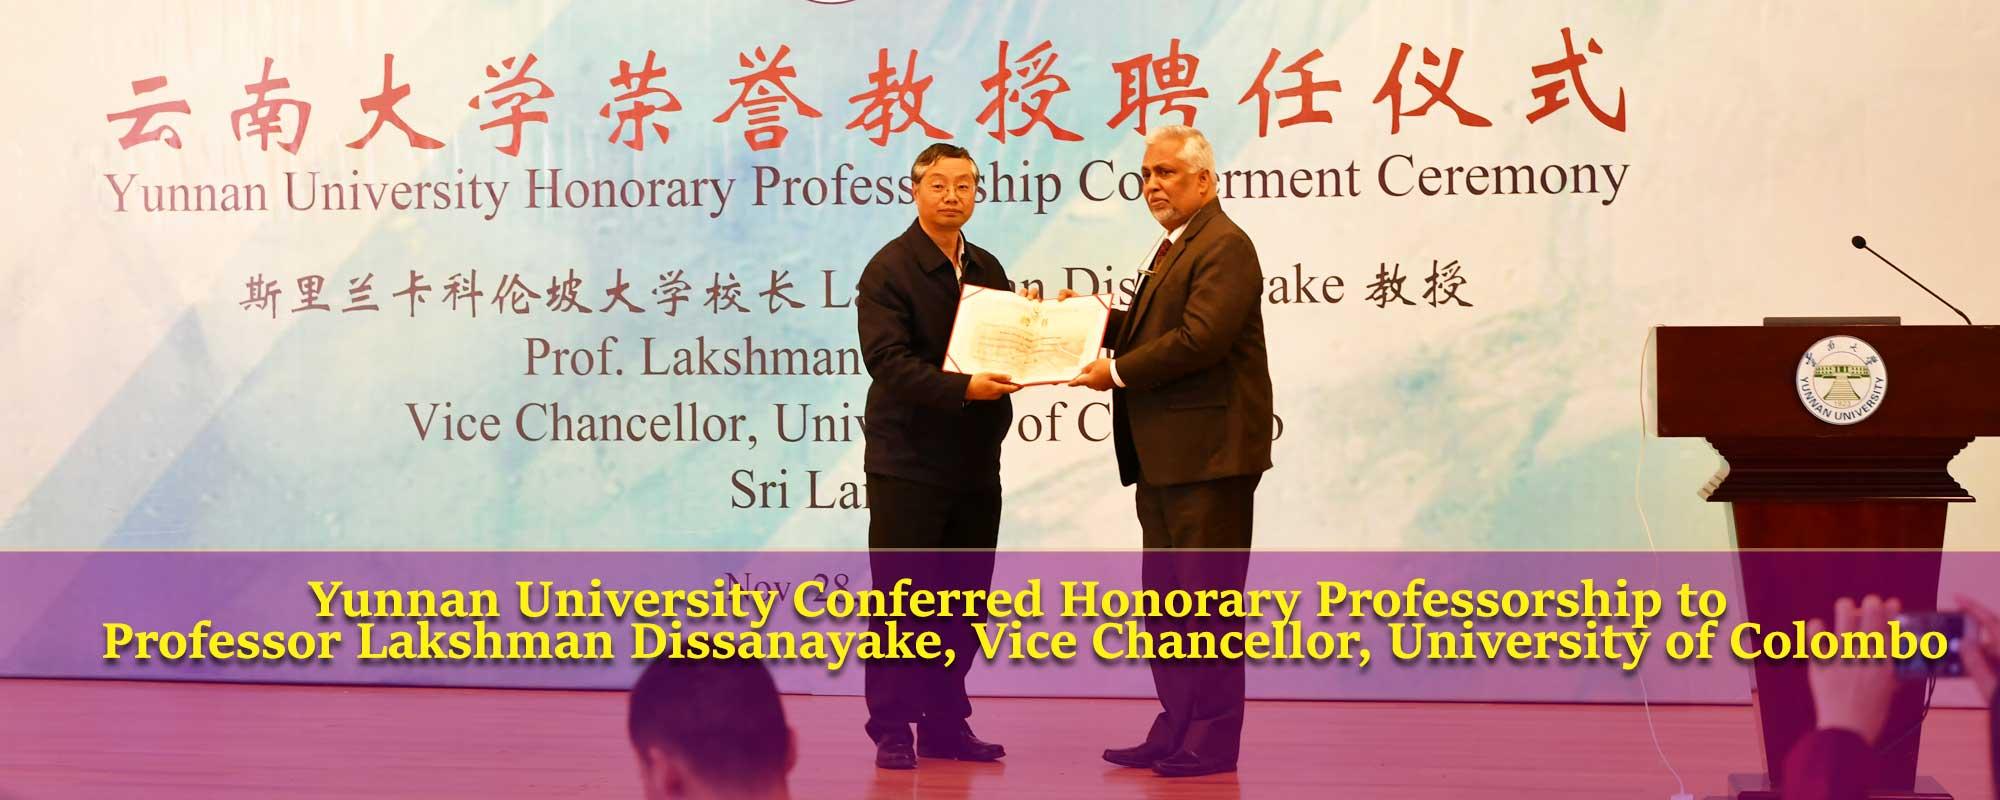 Yunnan University Conferred Honorary Professorship